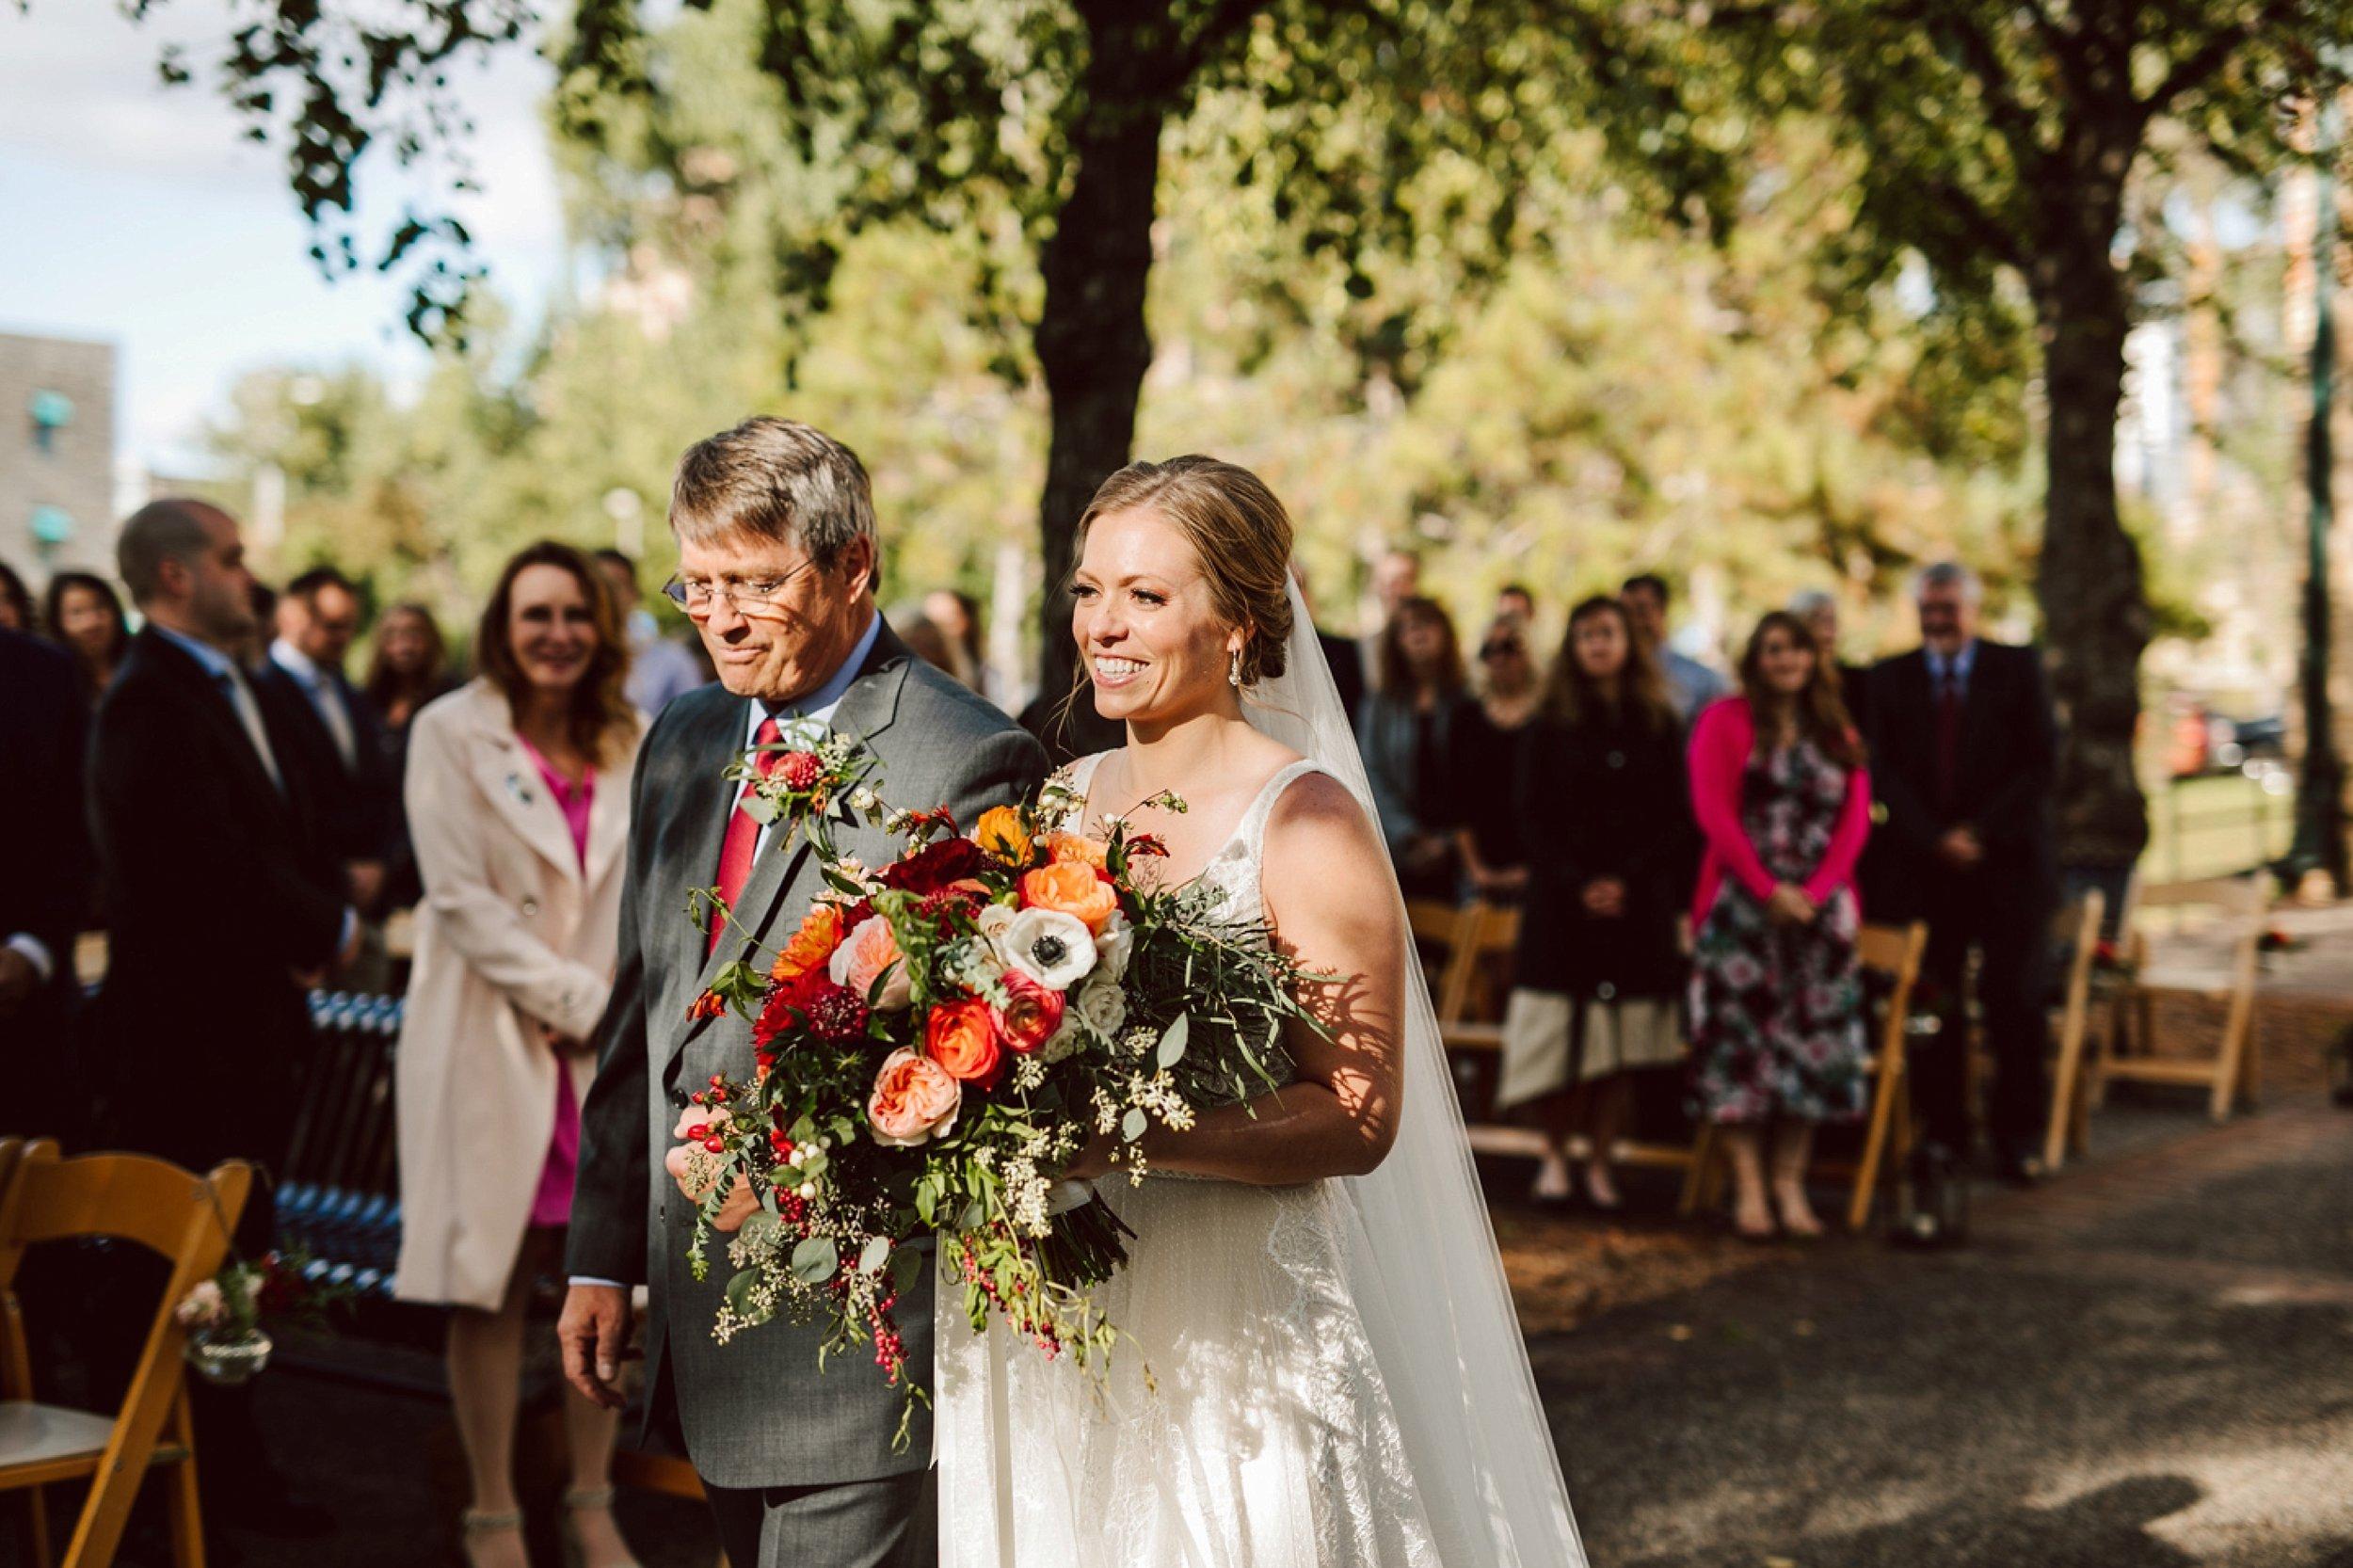 Nicollet-Island-Pavilion-Minneapolis-September-Coral-Navy-Wedding-99.jpg